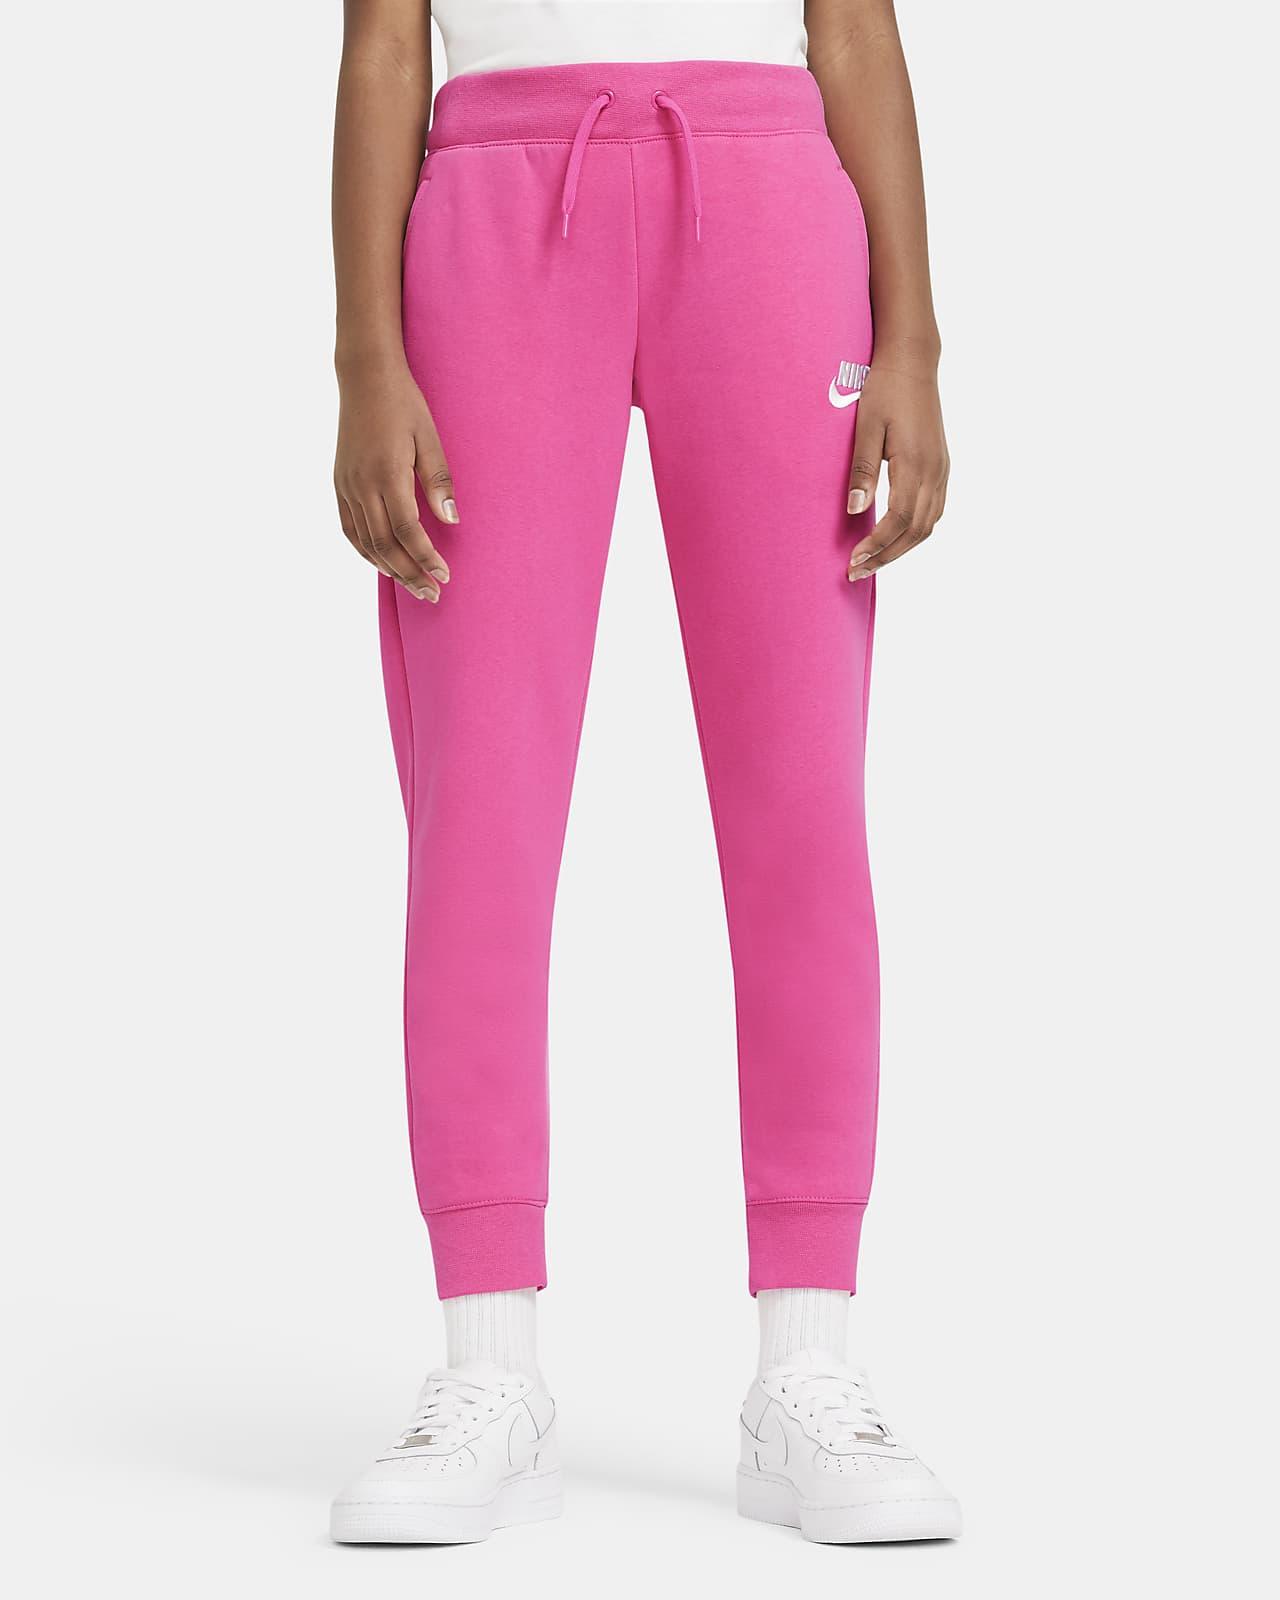 Nike Sportswear Big Kids' (Girls') Pants. Nike.com